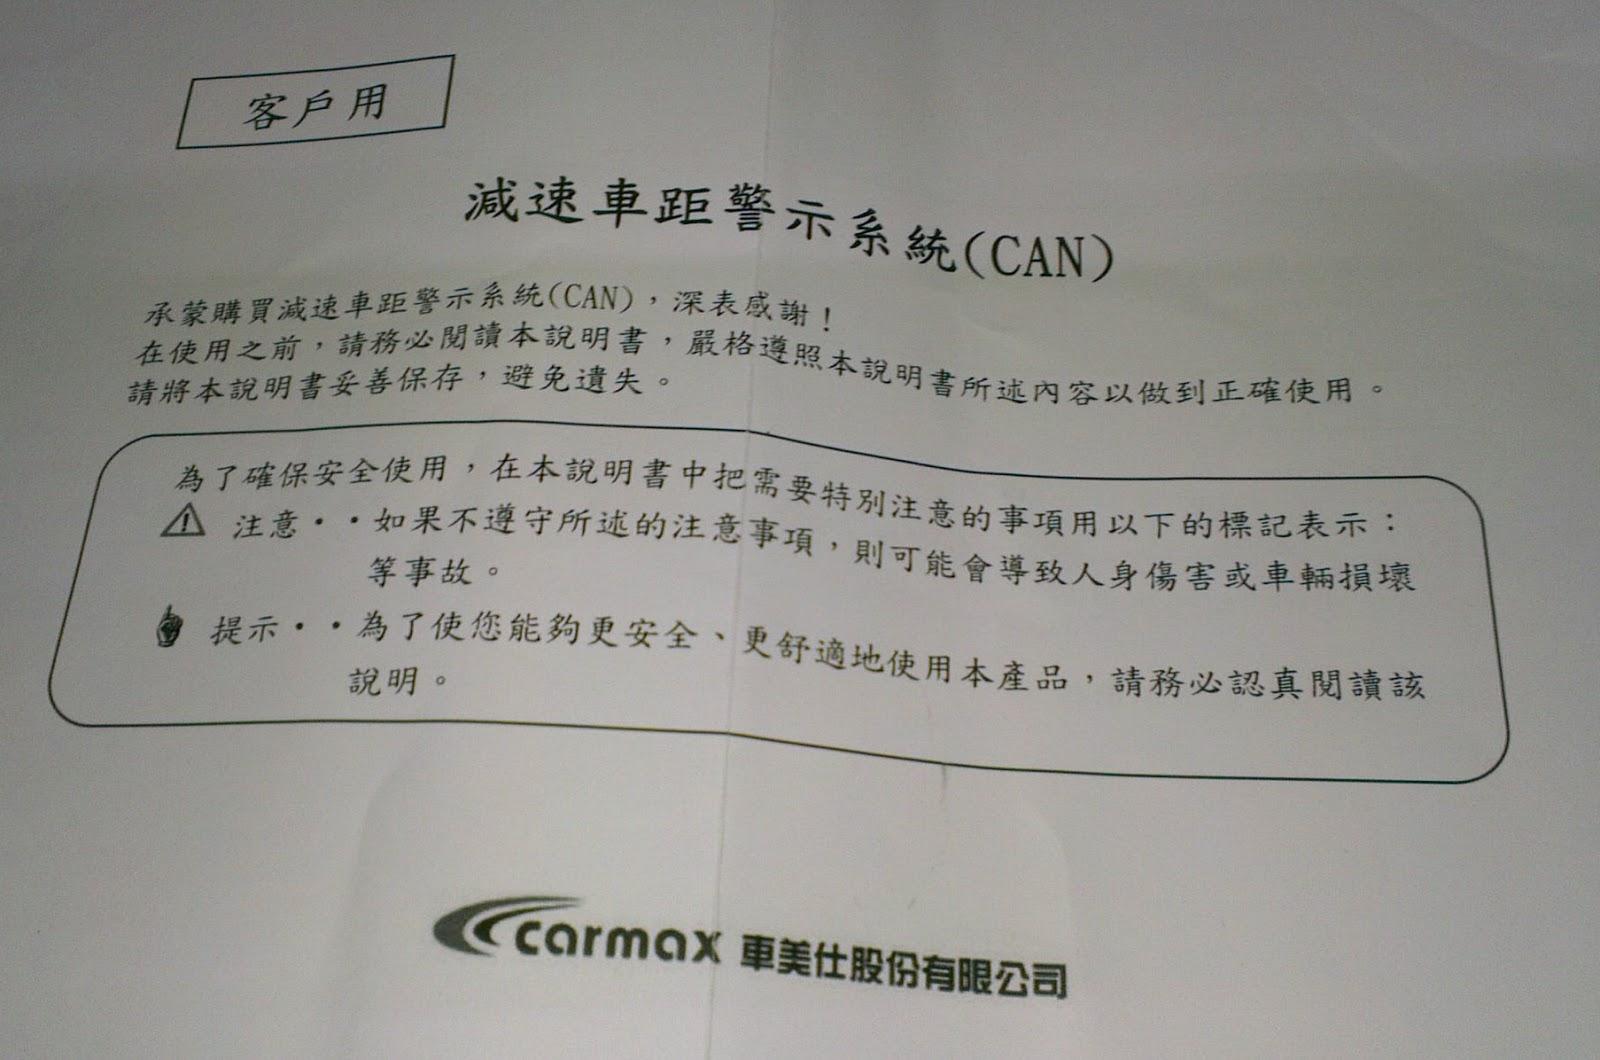 CMF資源回收場: 2015/12/26 交車後,Toyota RAV4 配備菜單組圖 X 33 分享